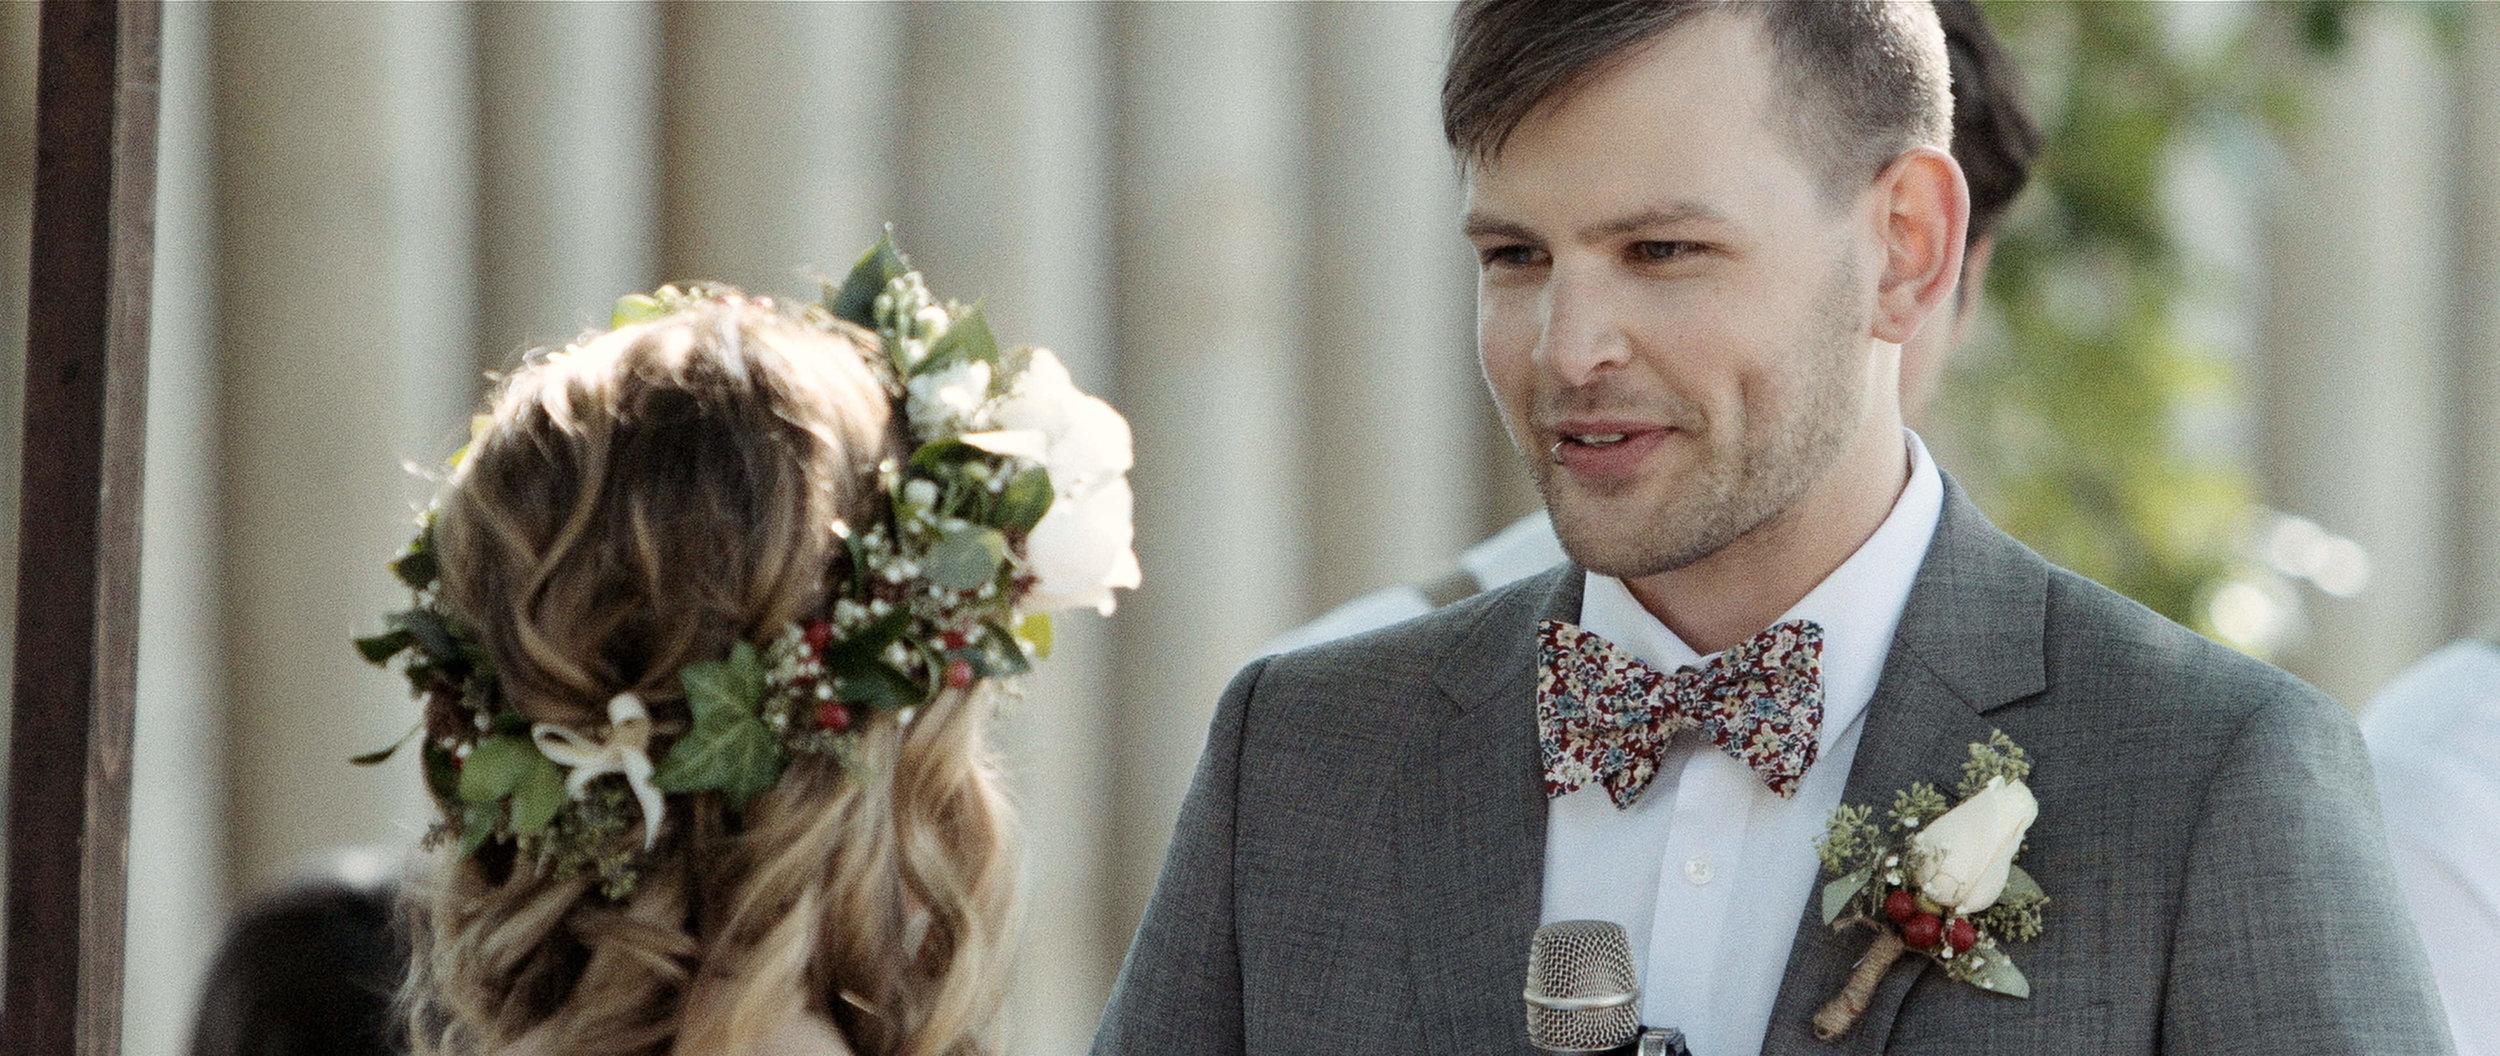 vancouver-wedding-videography158.jpg